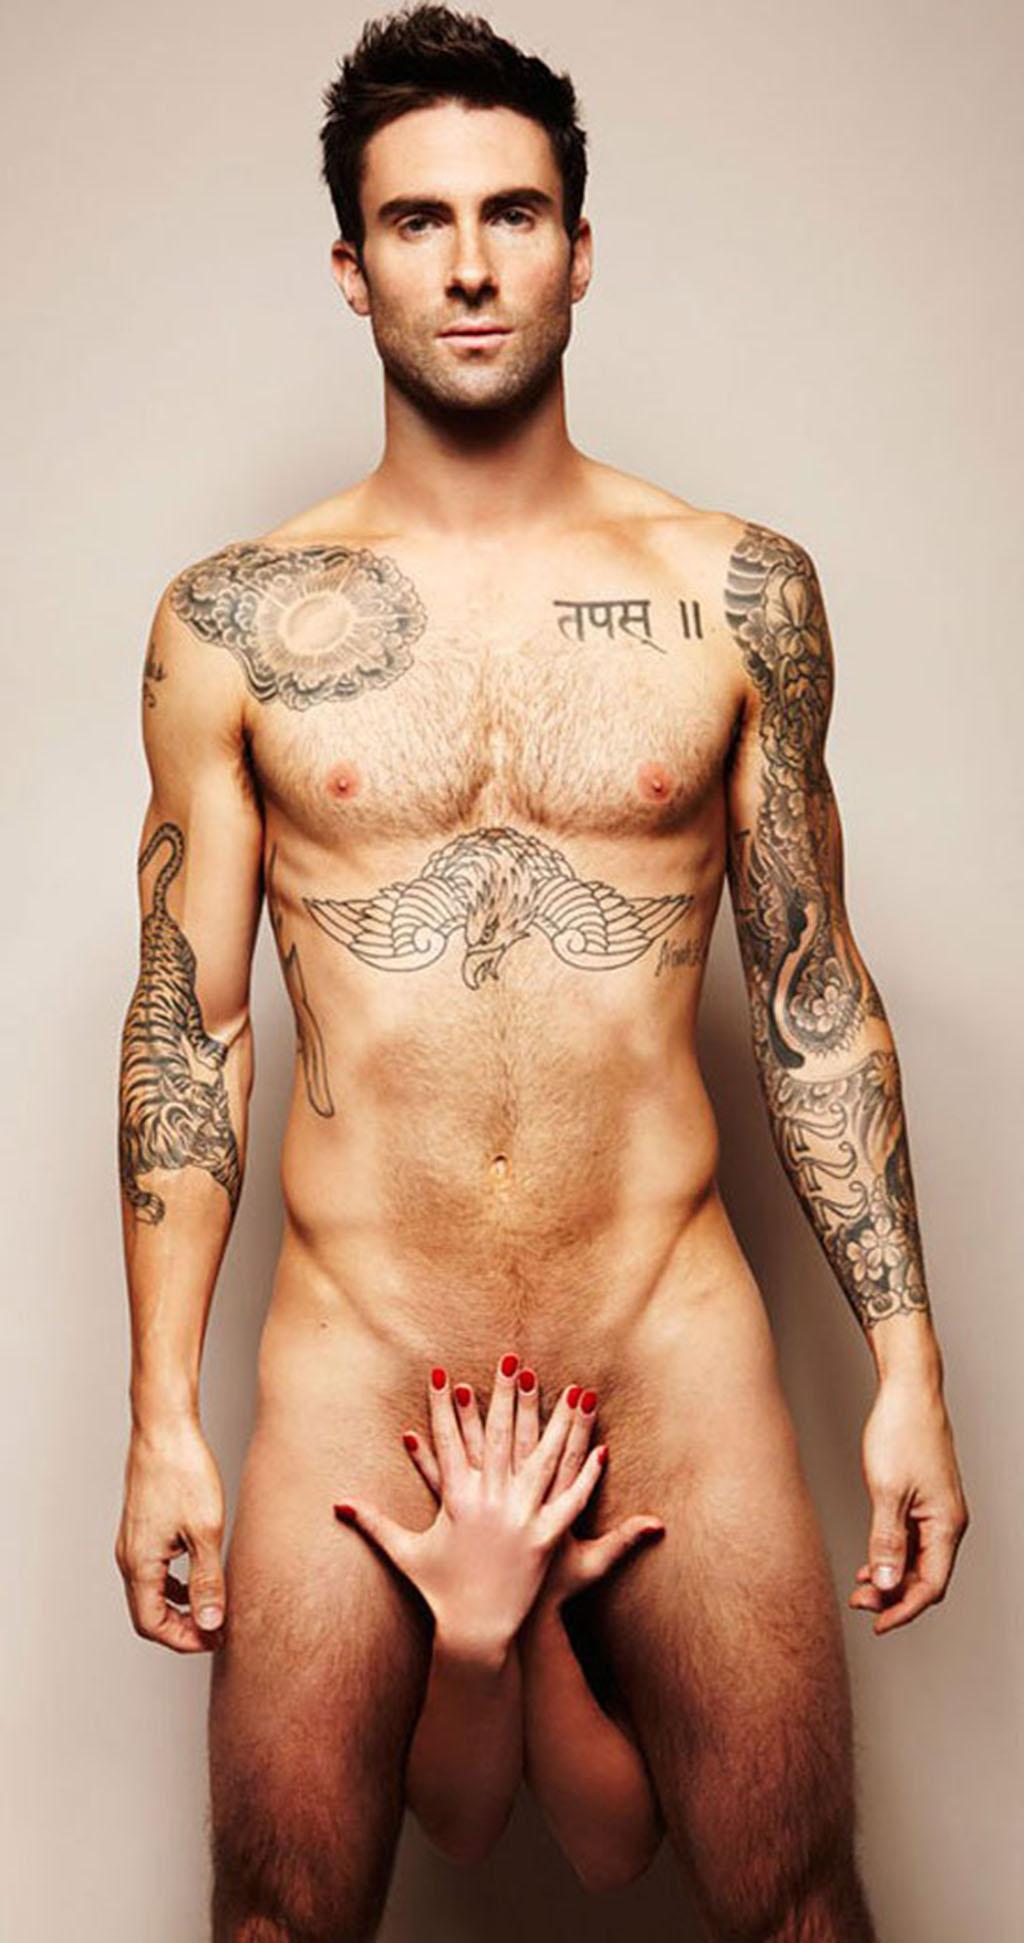 Maroon 5's Adam Levine Naked 1024